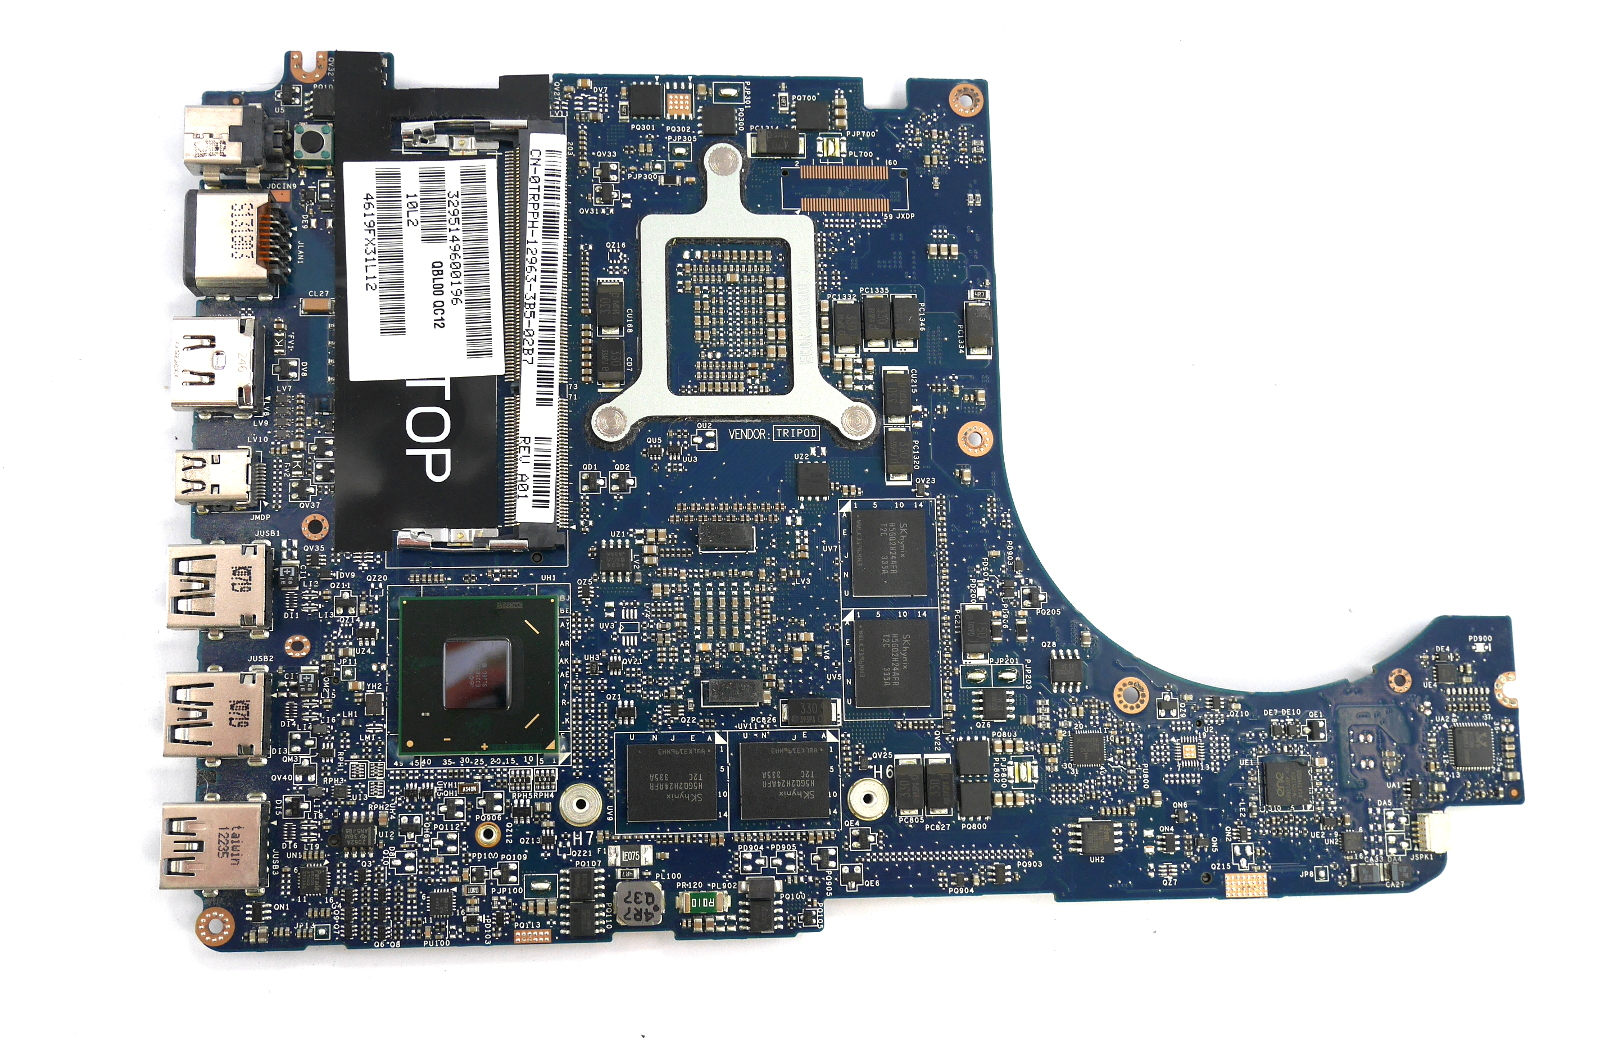 Dell TRPPH XPS 15 L521X Motherboard with BGA Intel Core i7-3632QM